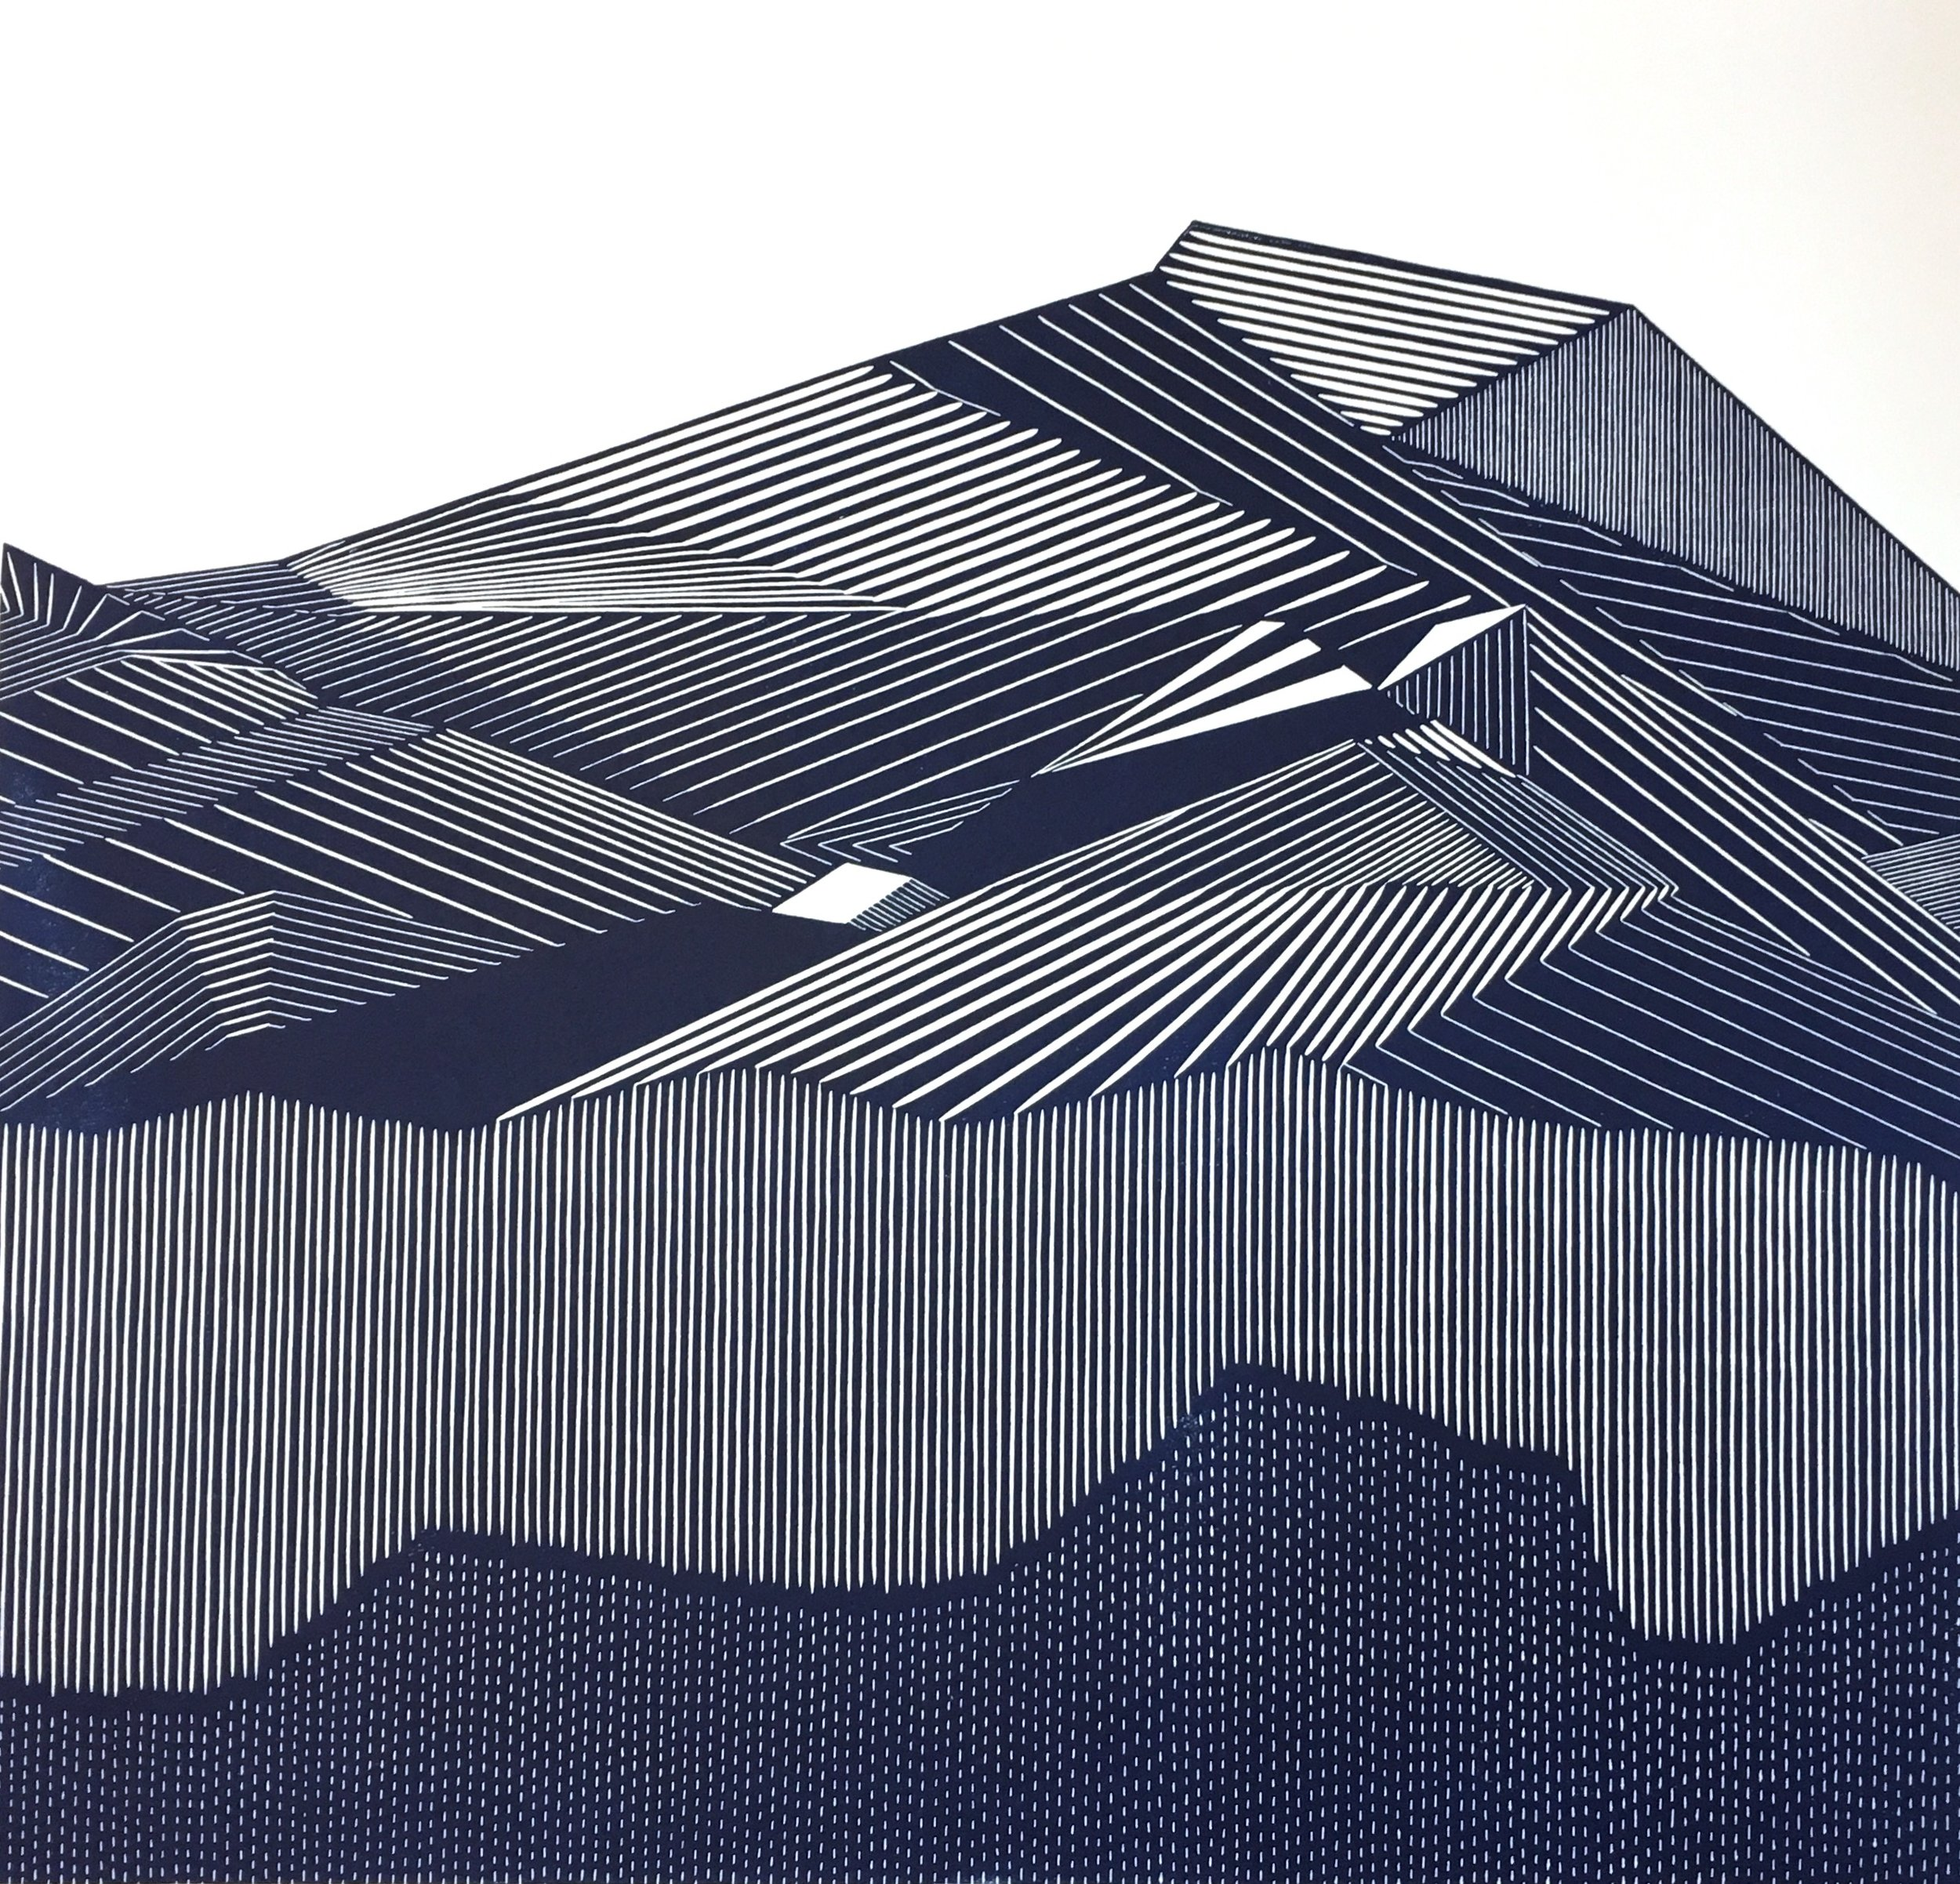 Kari Kristensen,  I Shut My Eyes in Order to See , 2017, linoprint